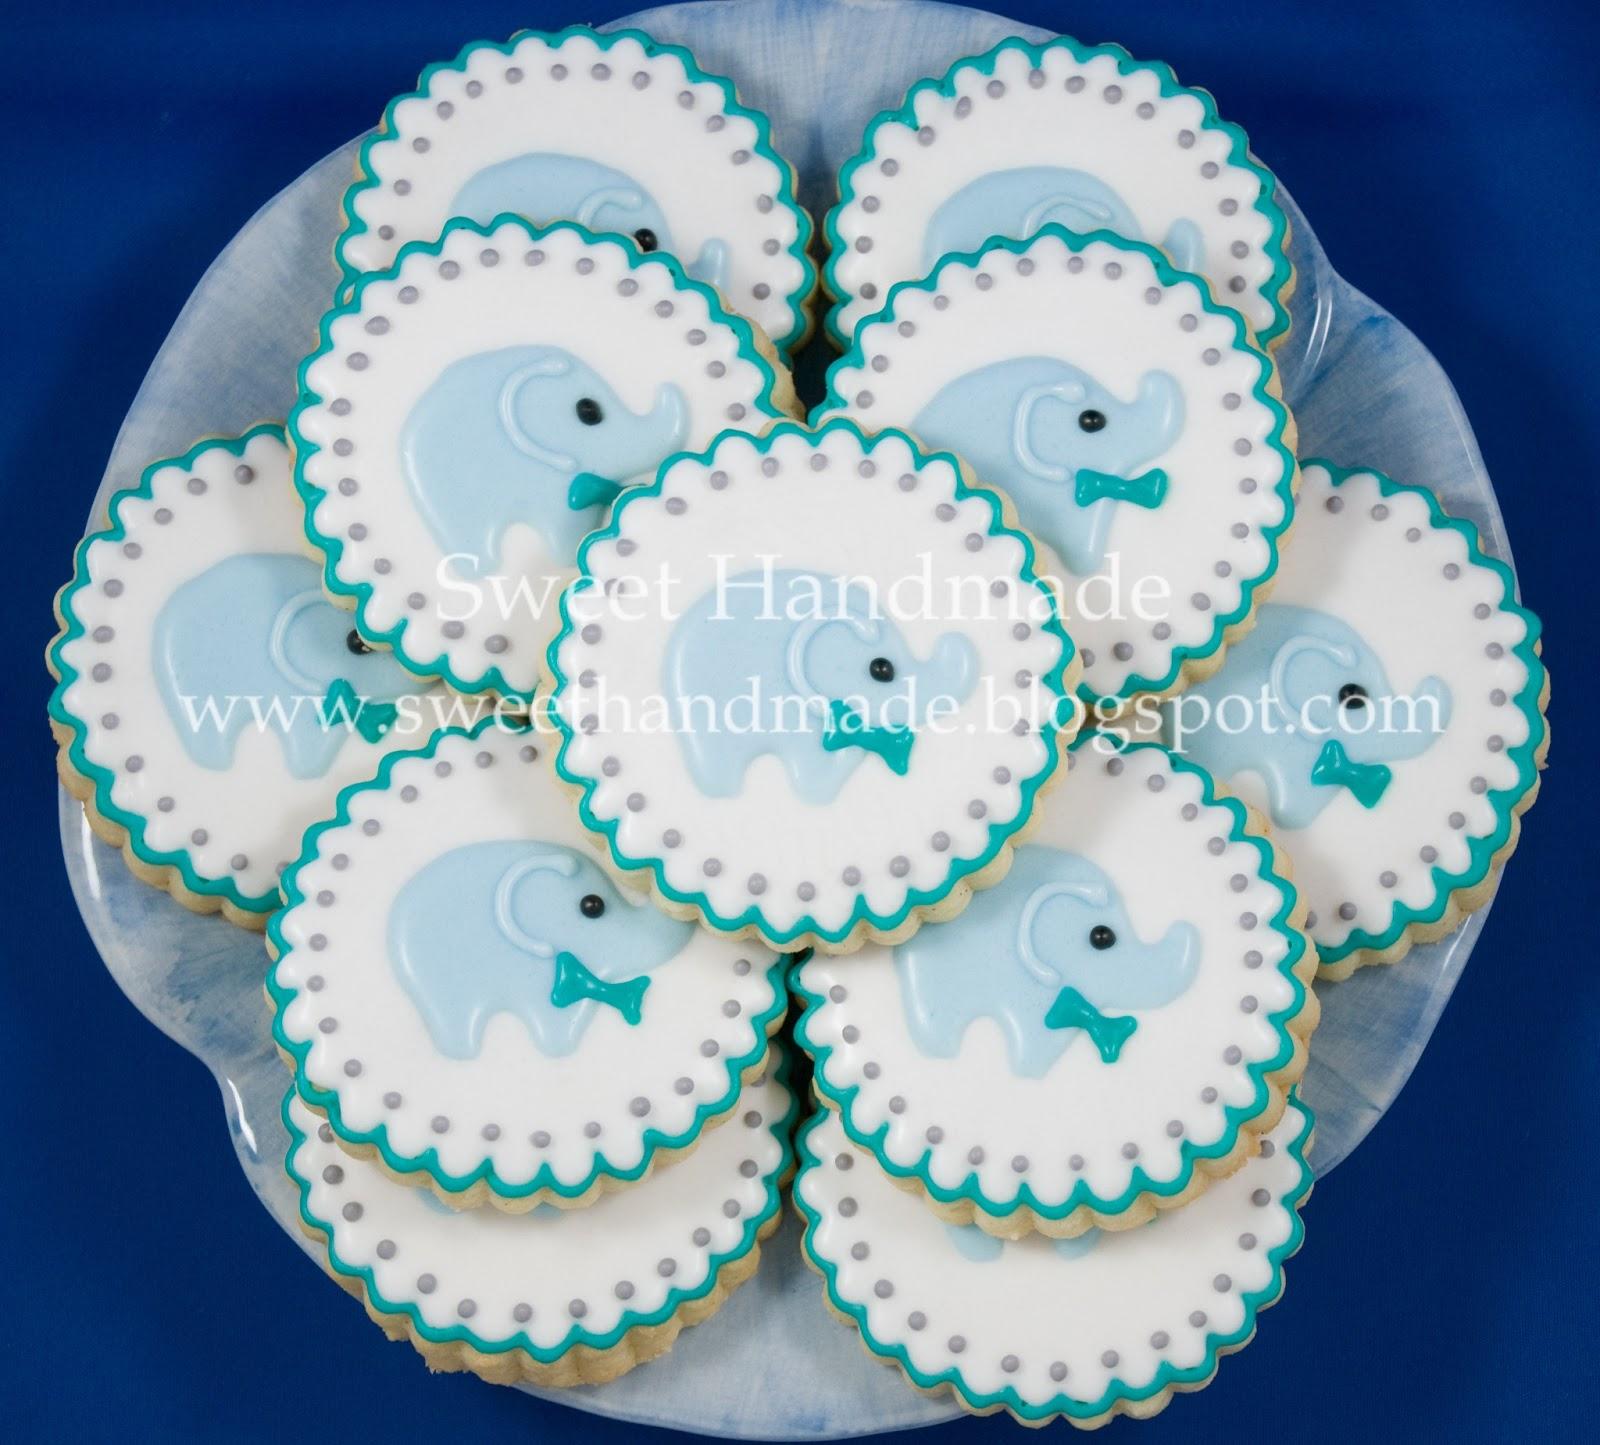 Sweet Handmade Cookies Baby Shower Cookies With An Elephant Theme